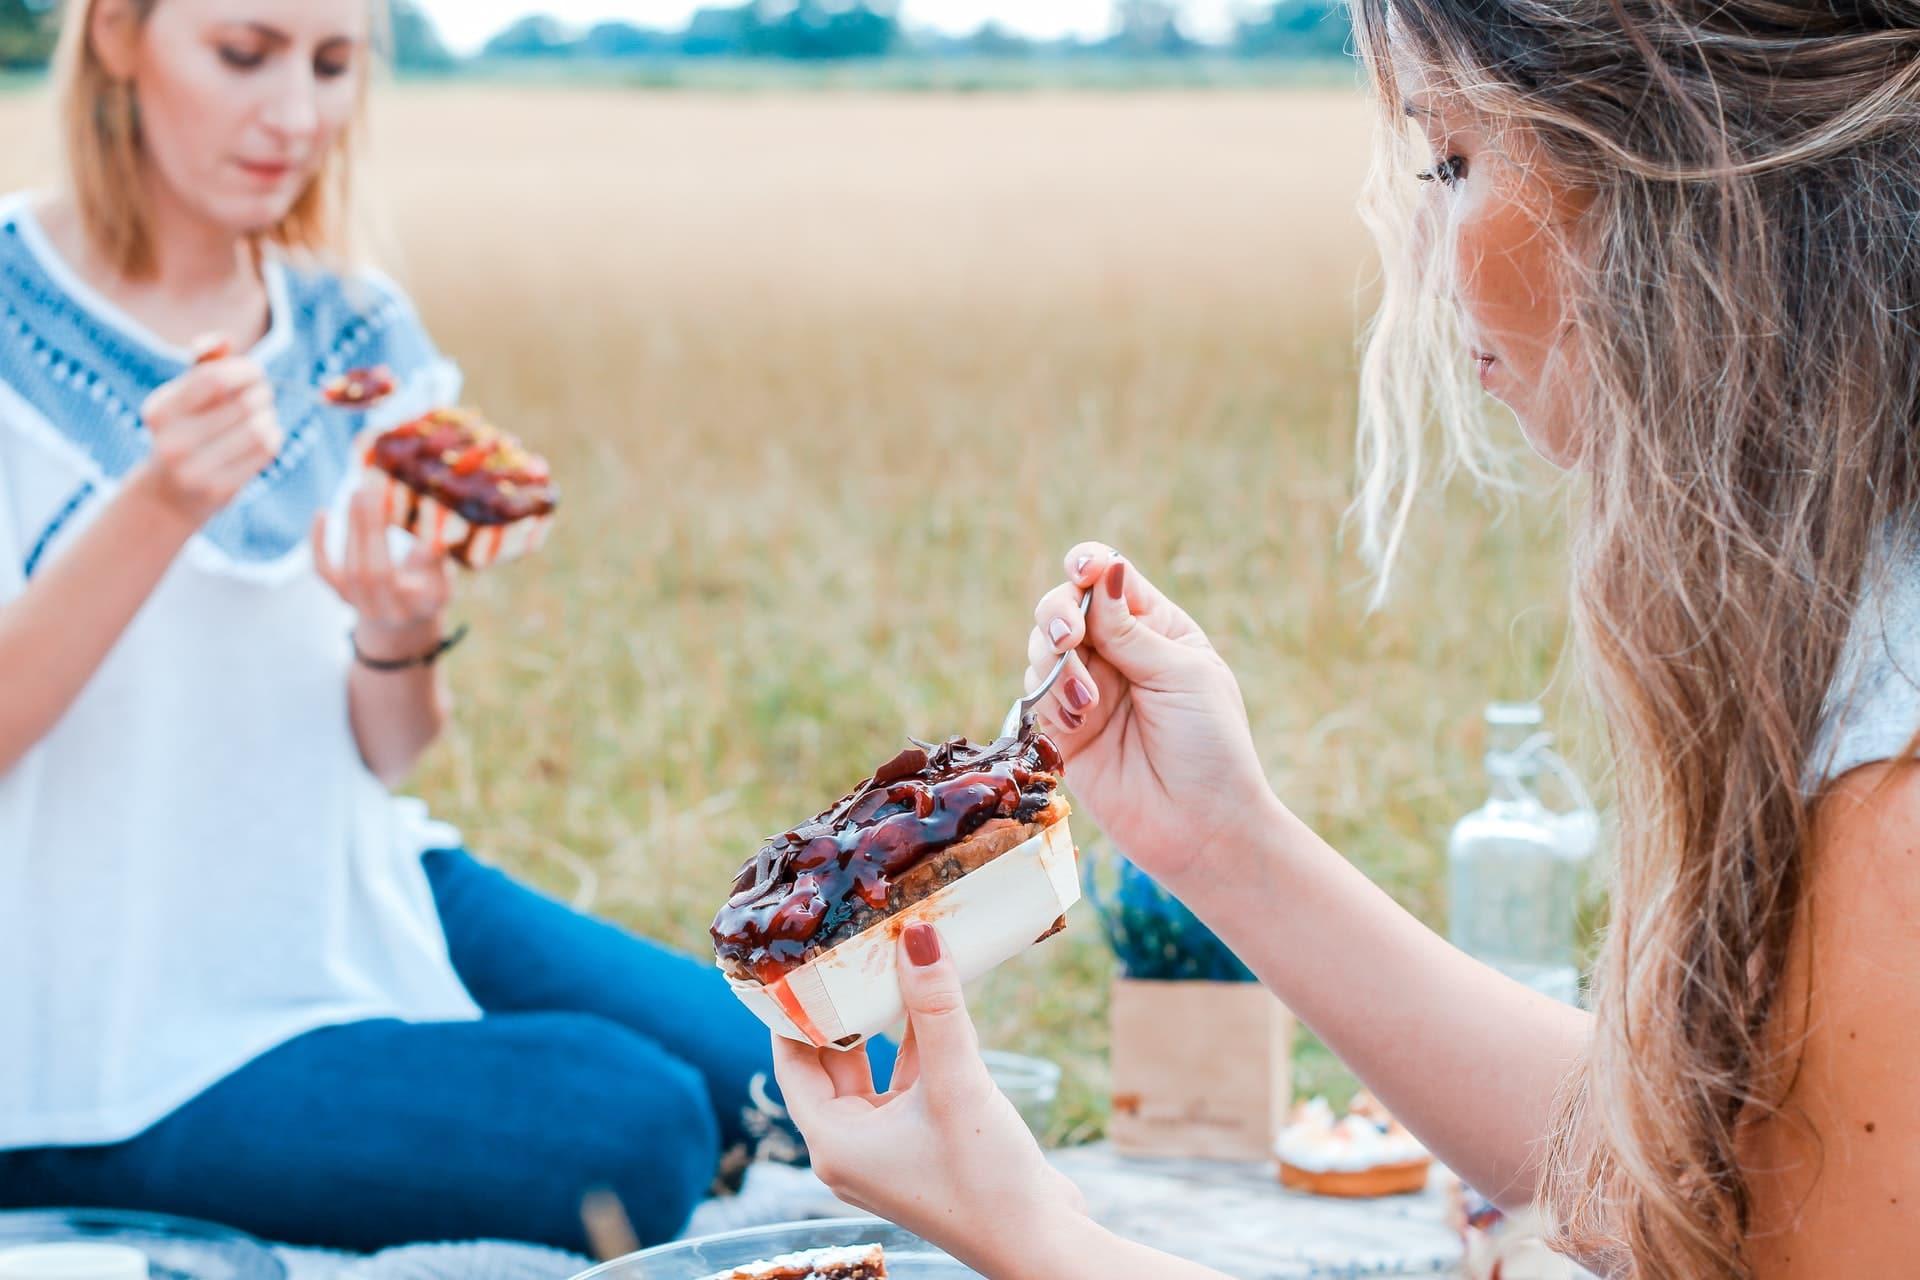 toa heftiba TTI1k1mVAY unsplash - Day Treatment Options for Eating Disorders